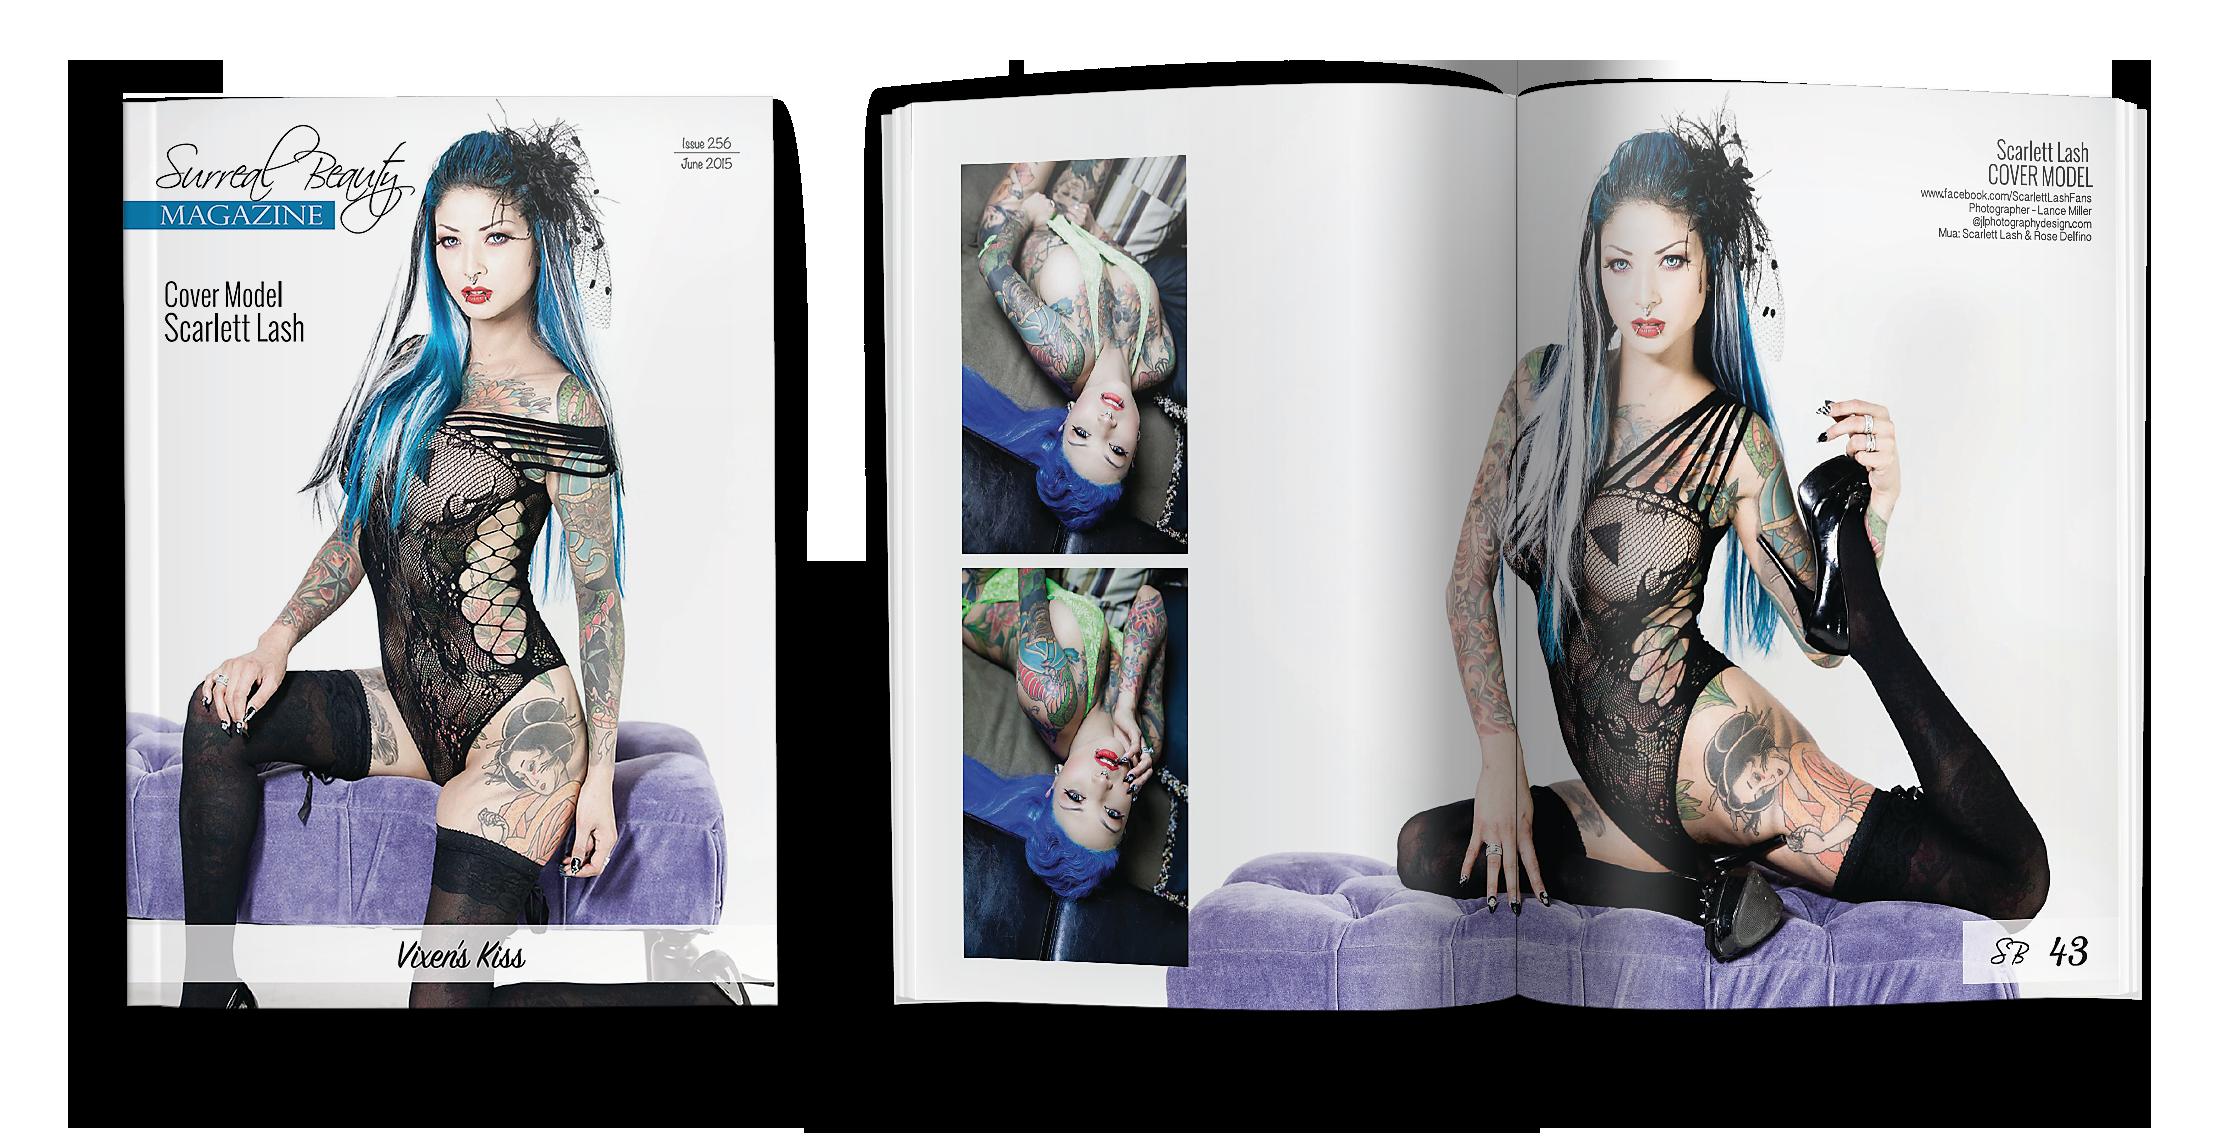 Surreal_Beauty_Magazine_Vixen_s_Kiss_Render7.png